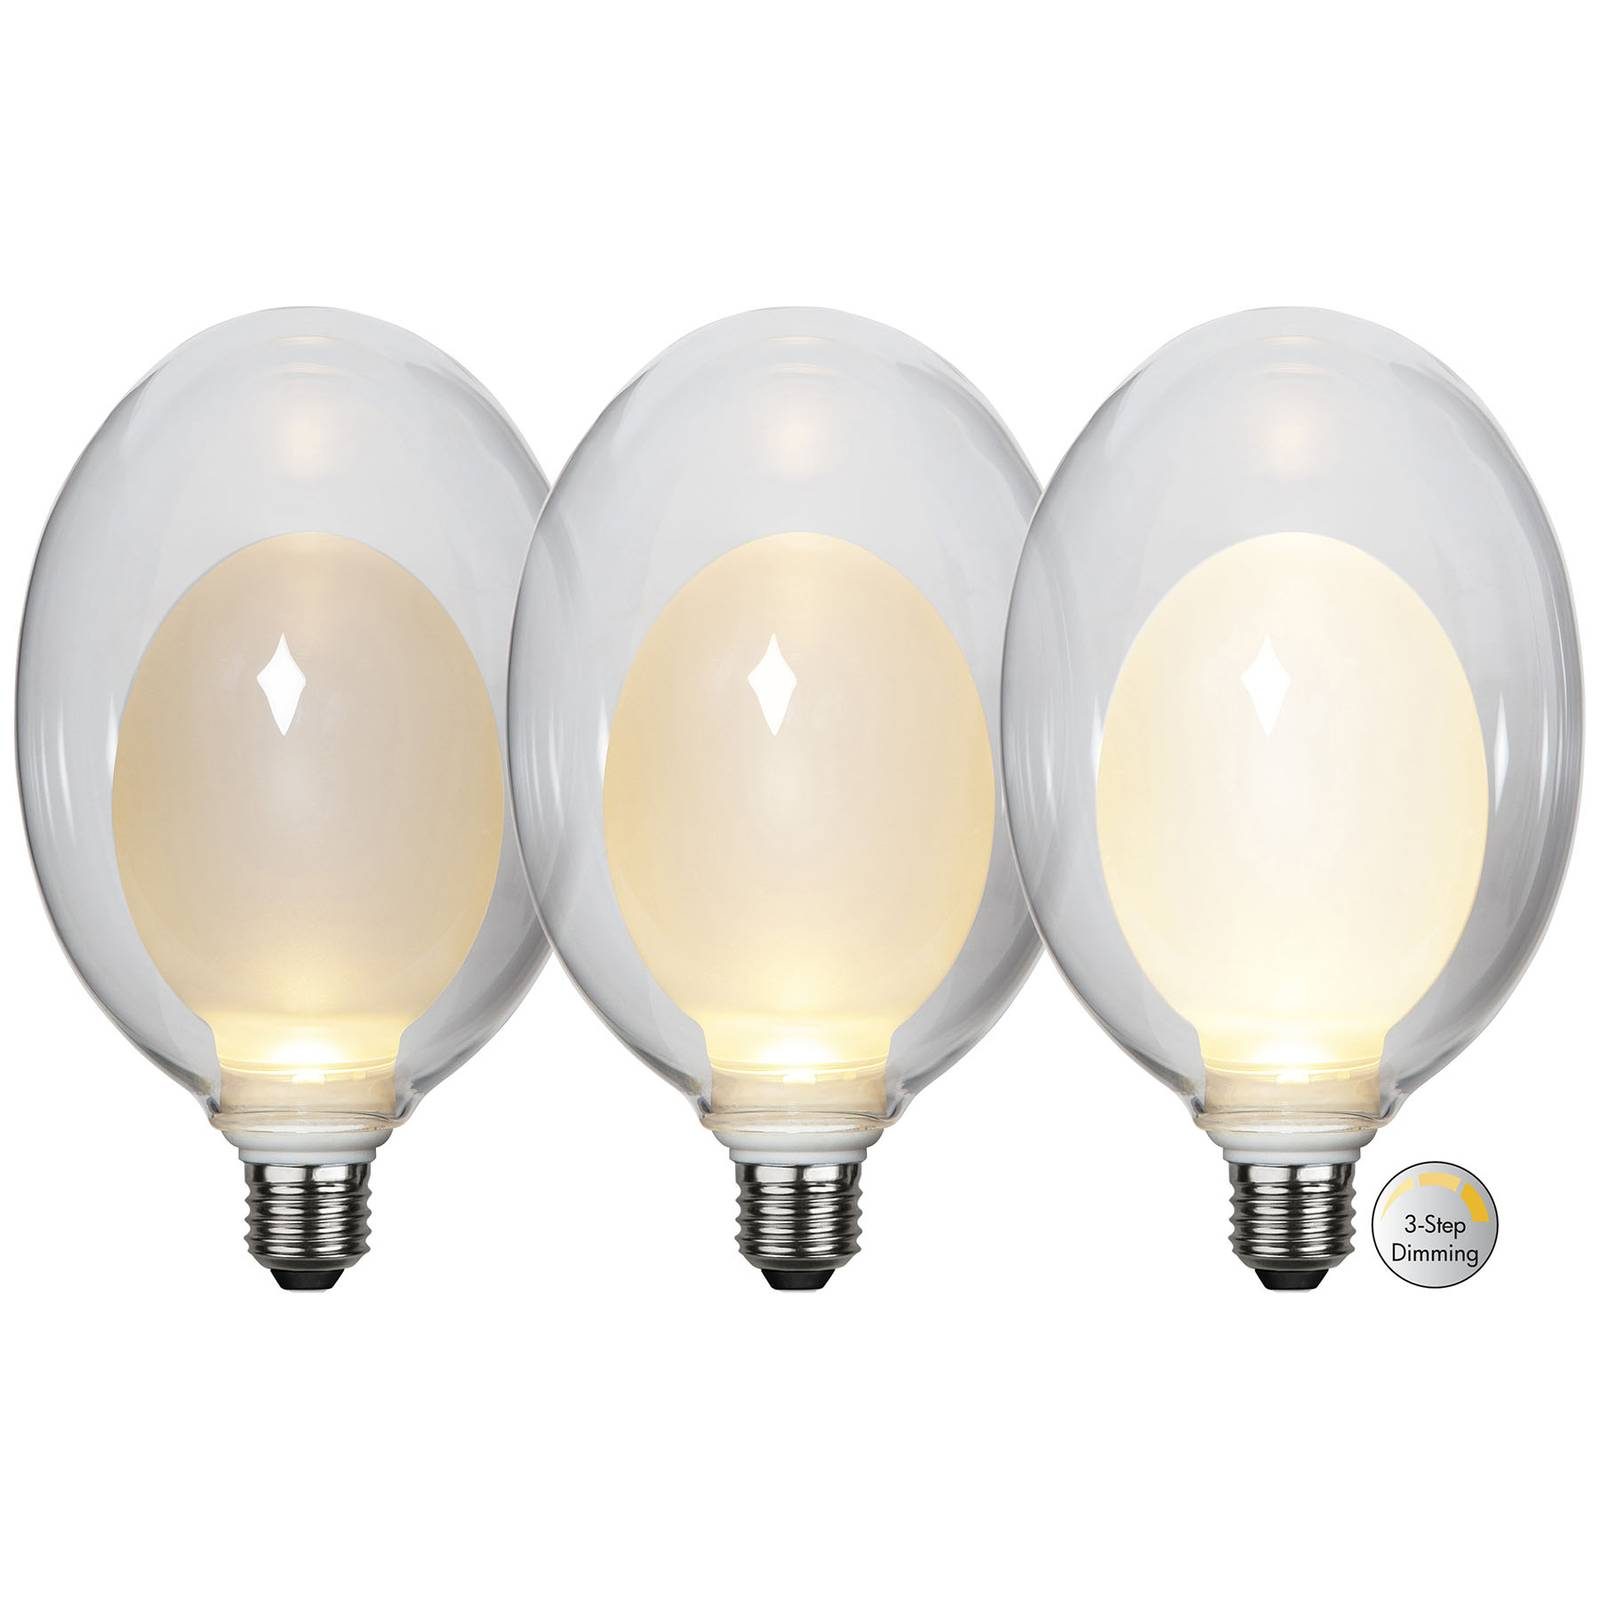 LED-lamppu Space E27 3,5W D120, opaali, 3-step dim